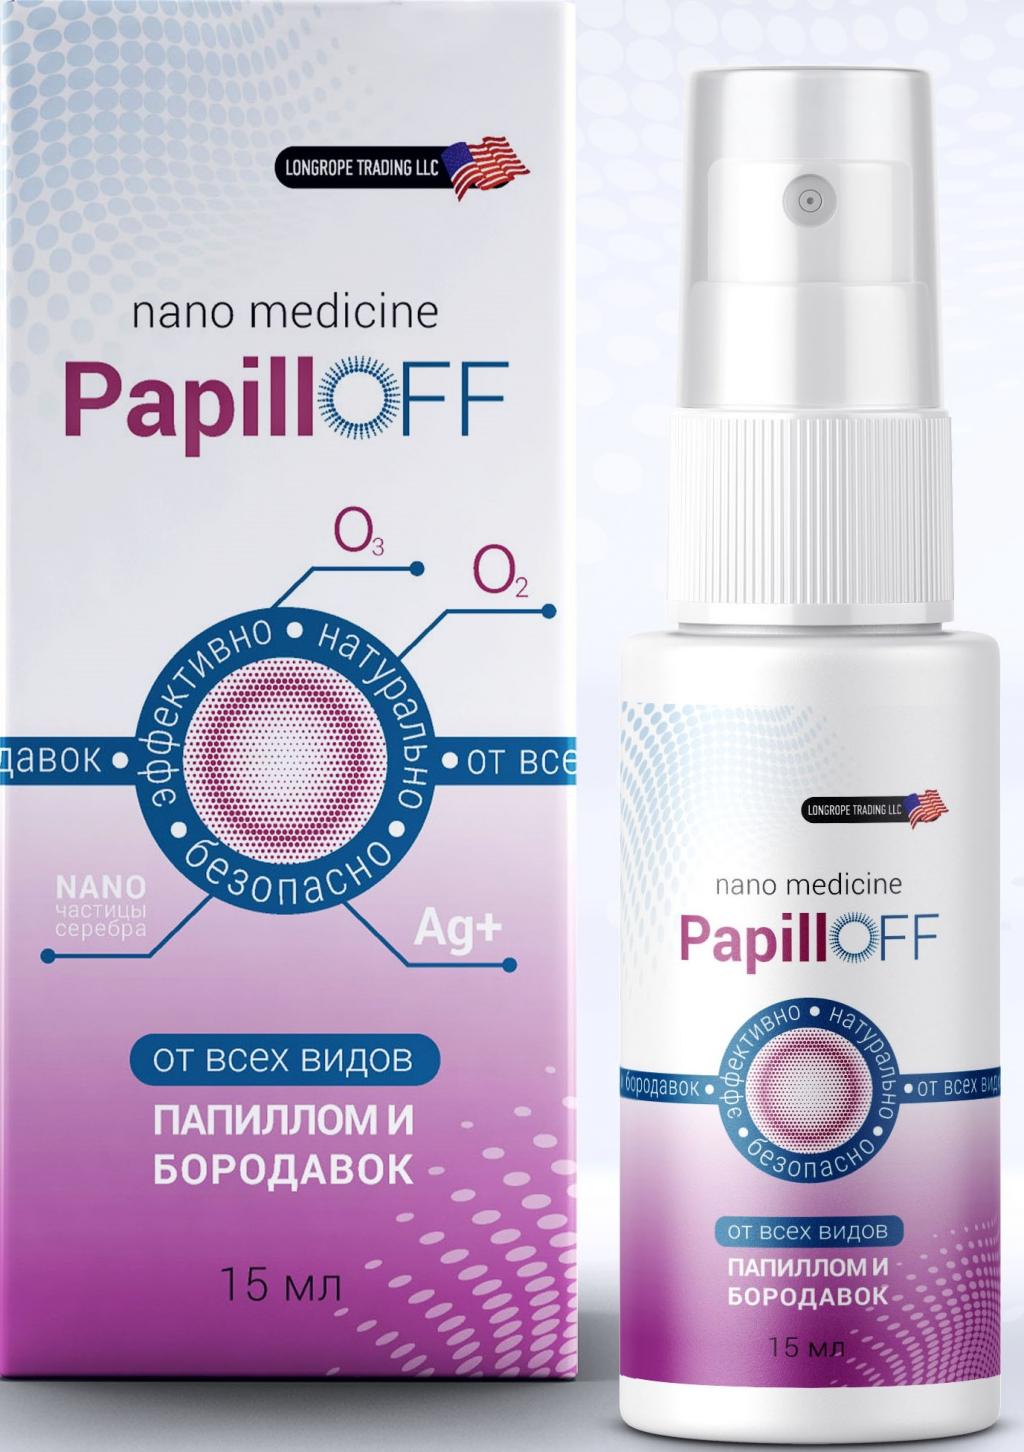 PapillOFF от папиллом и бородавок в Экибастузе